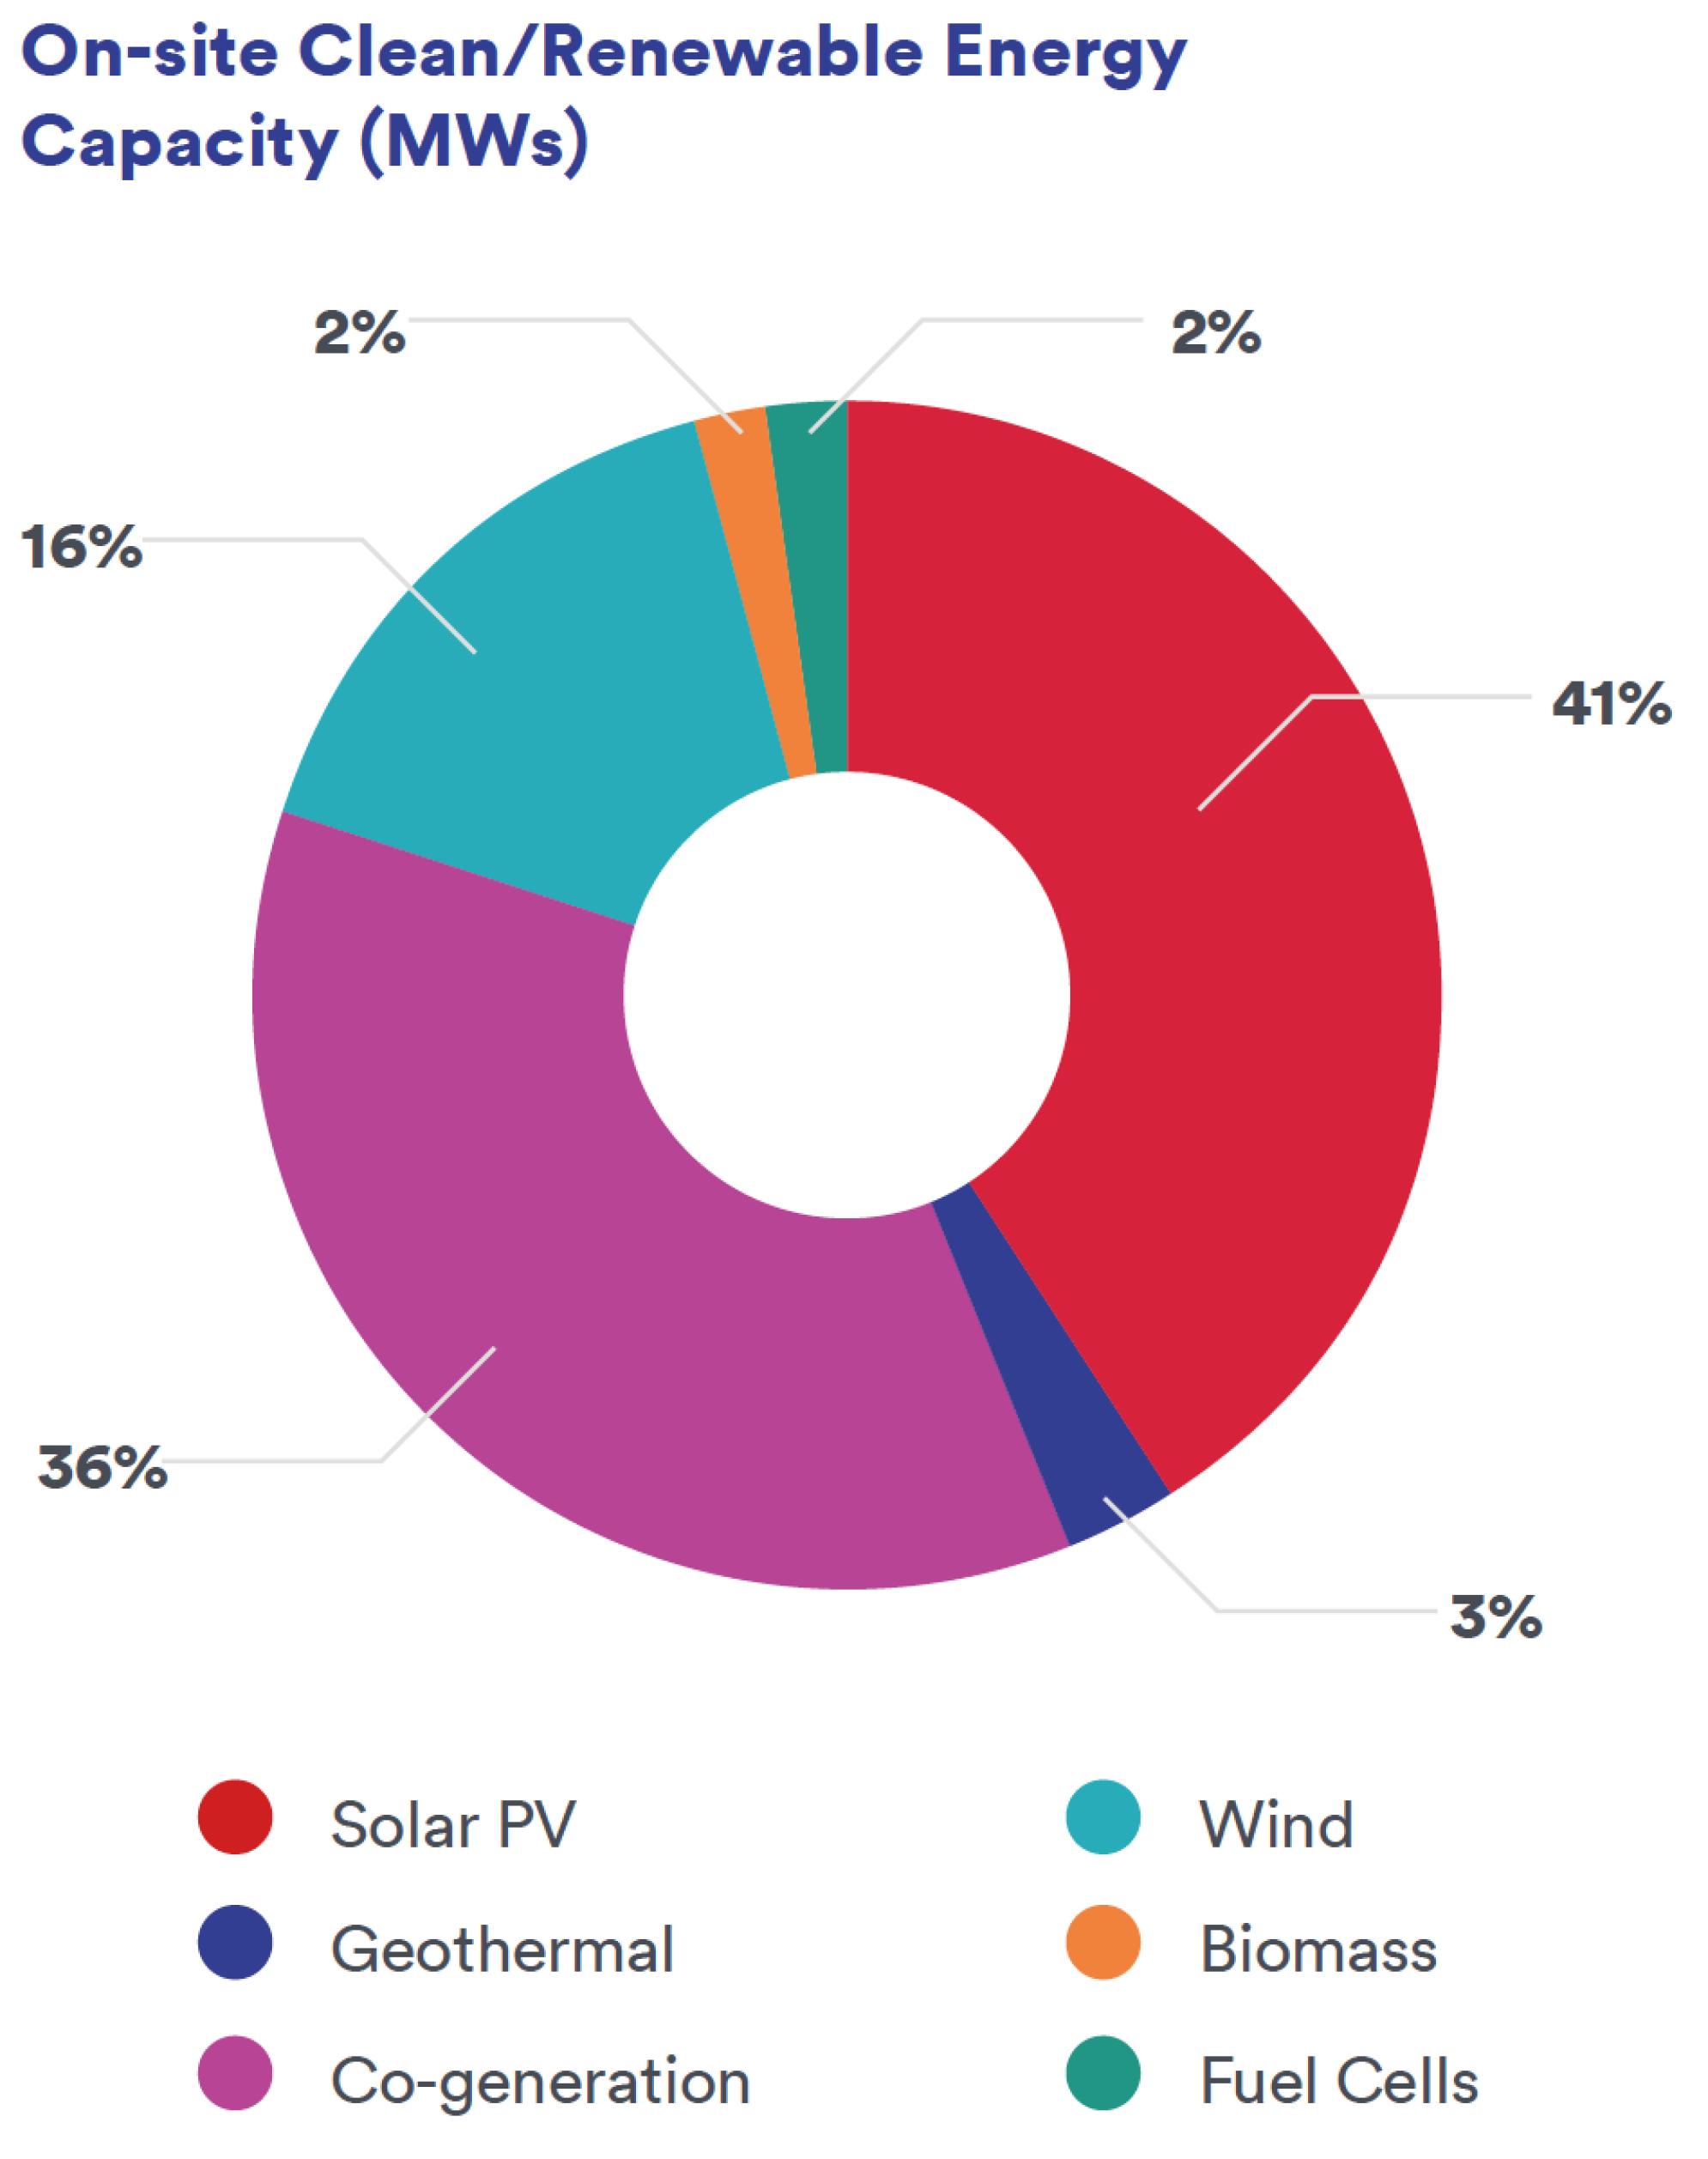 On-site Clean/Renewable Energy Capacity (MWs)